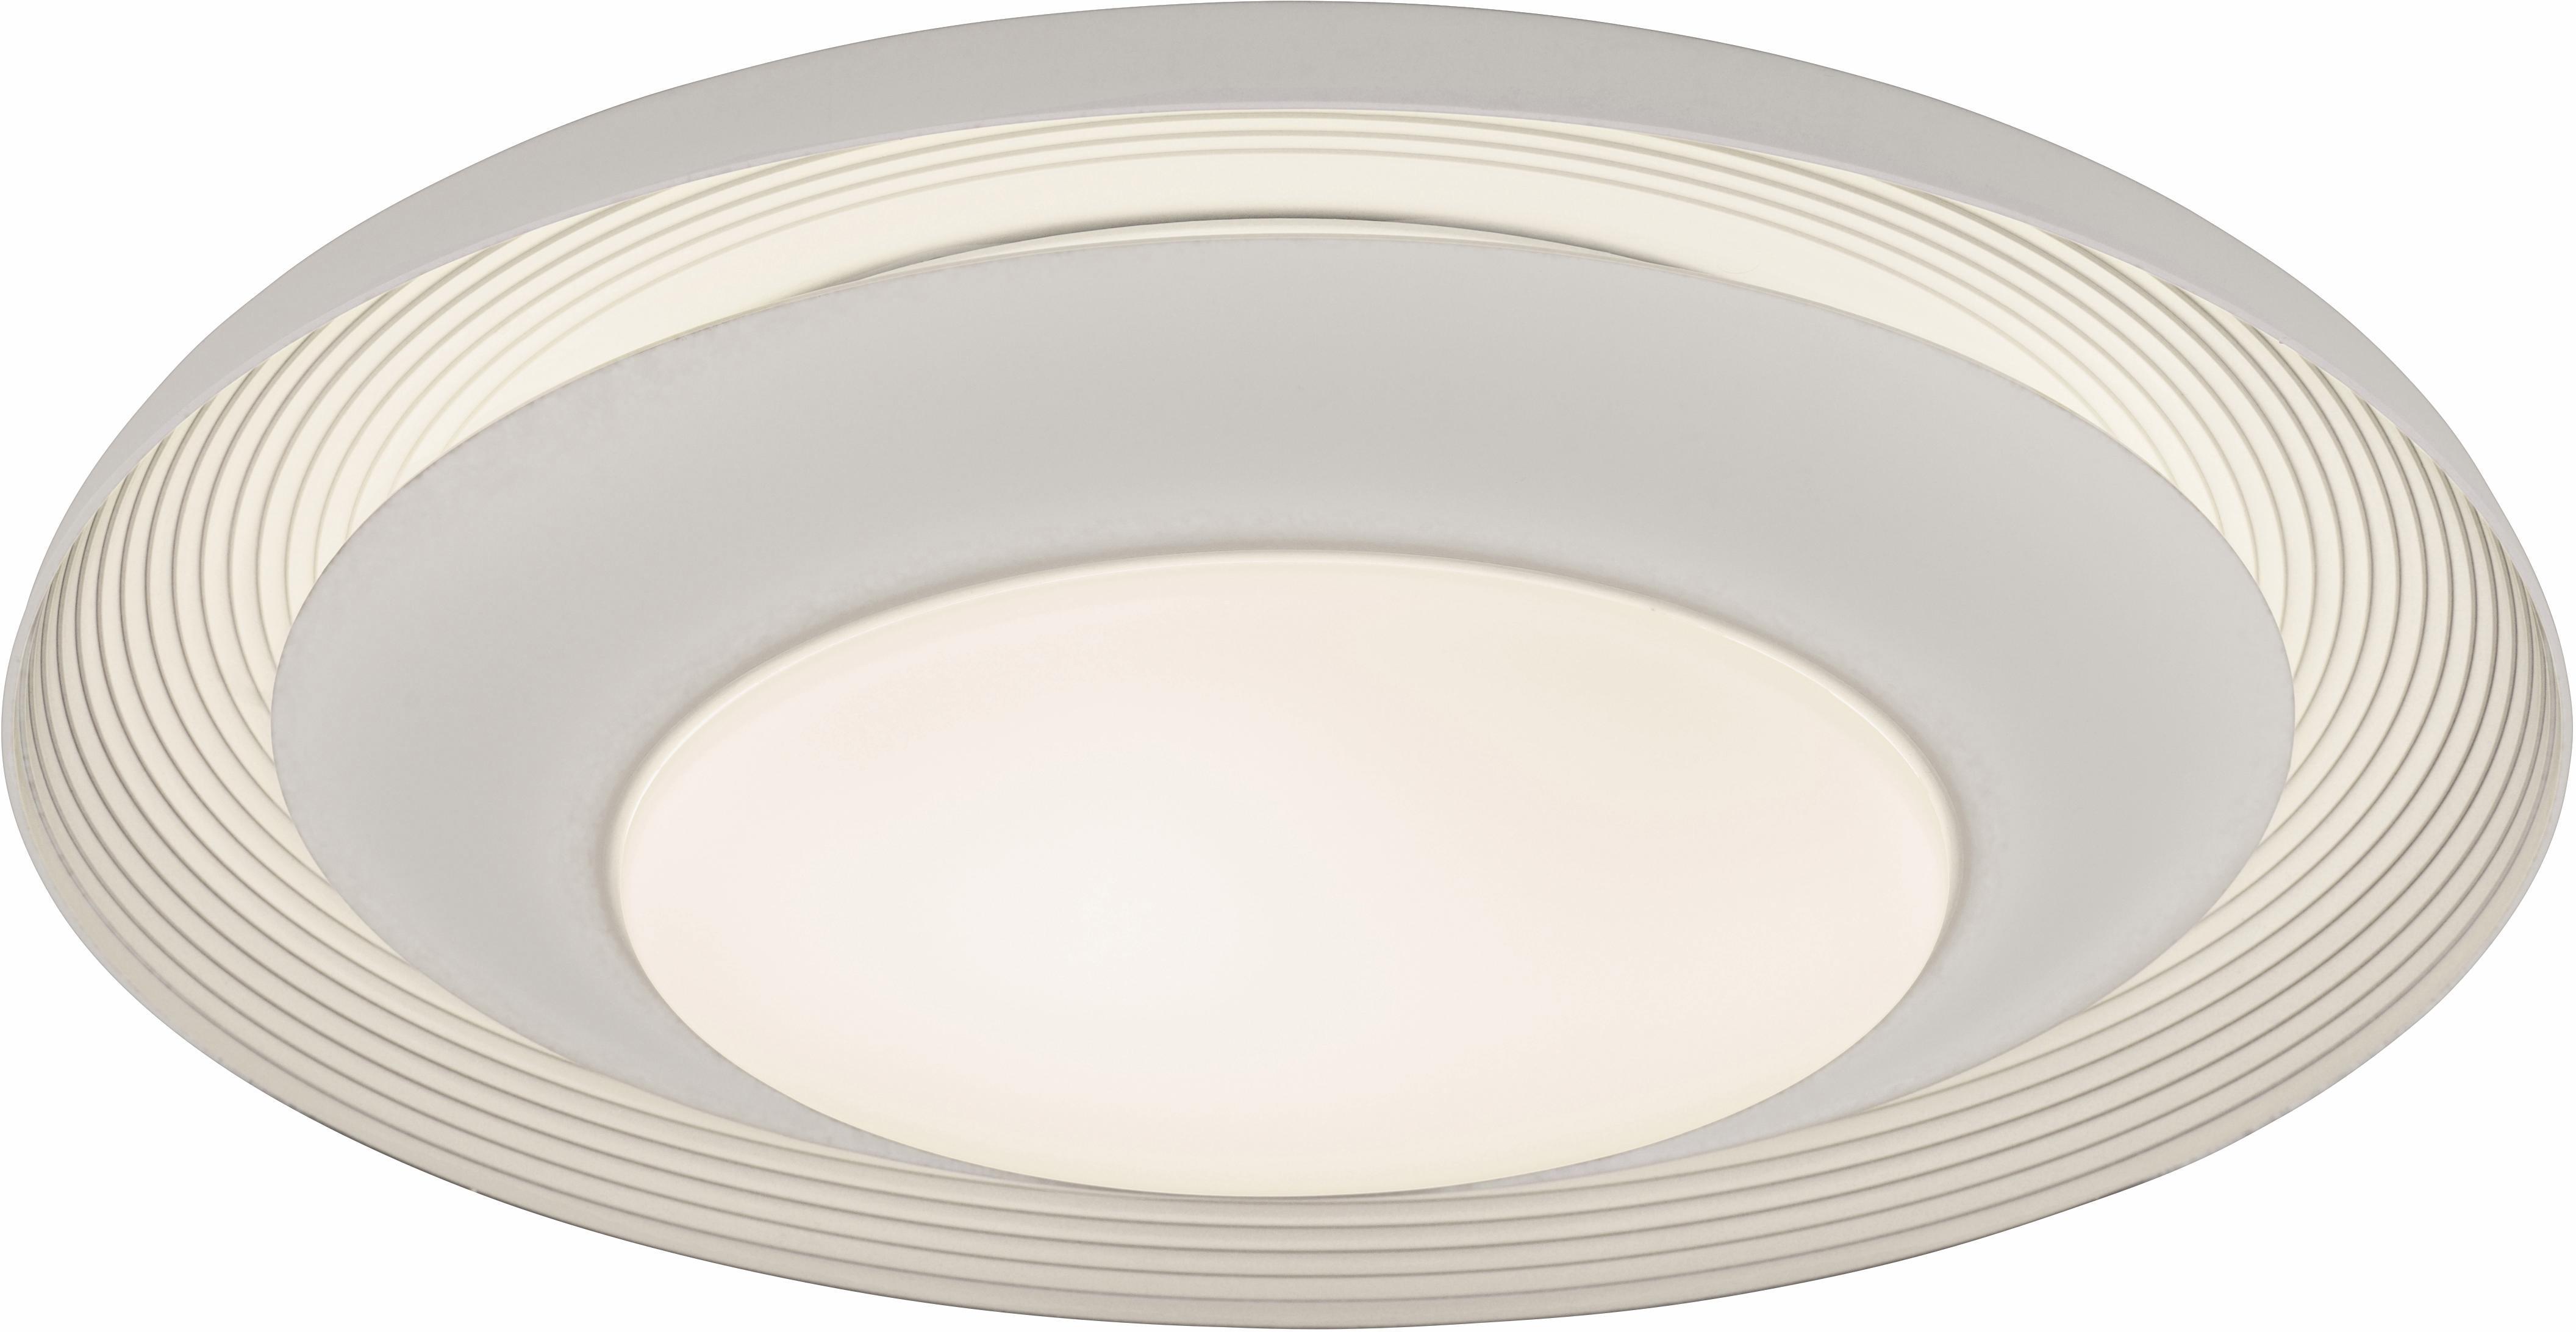 EGLO,LED Deckenleuchte CANICOSA